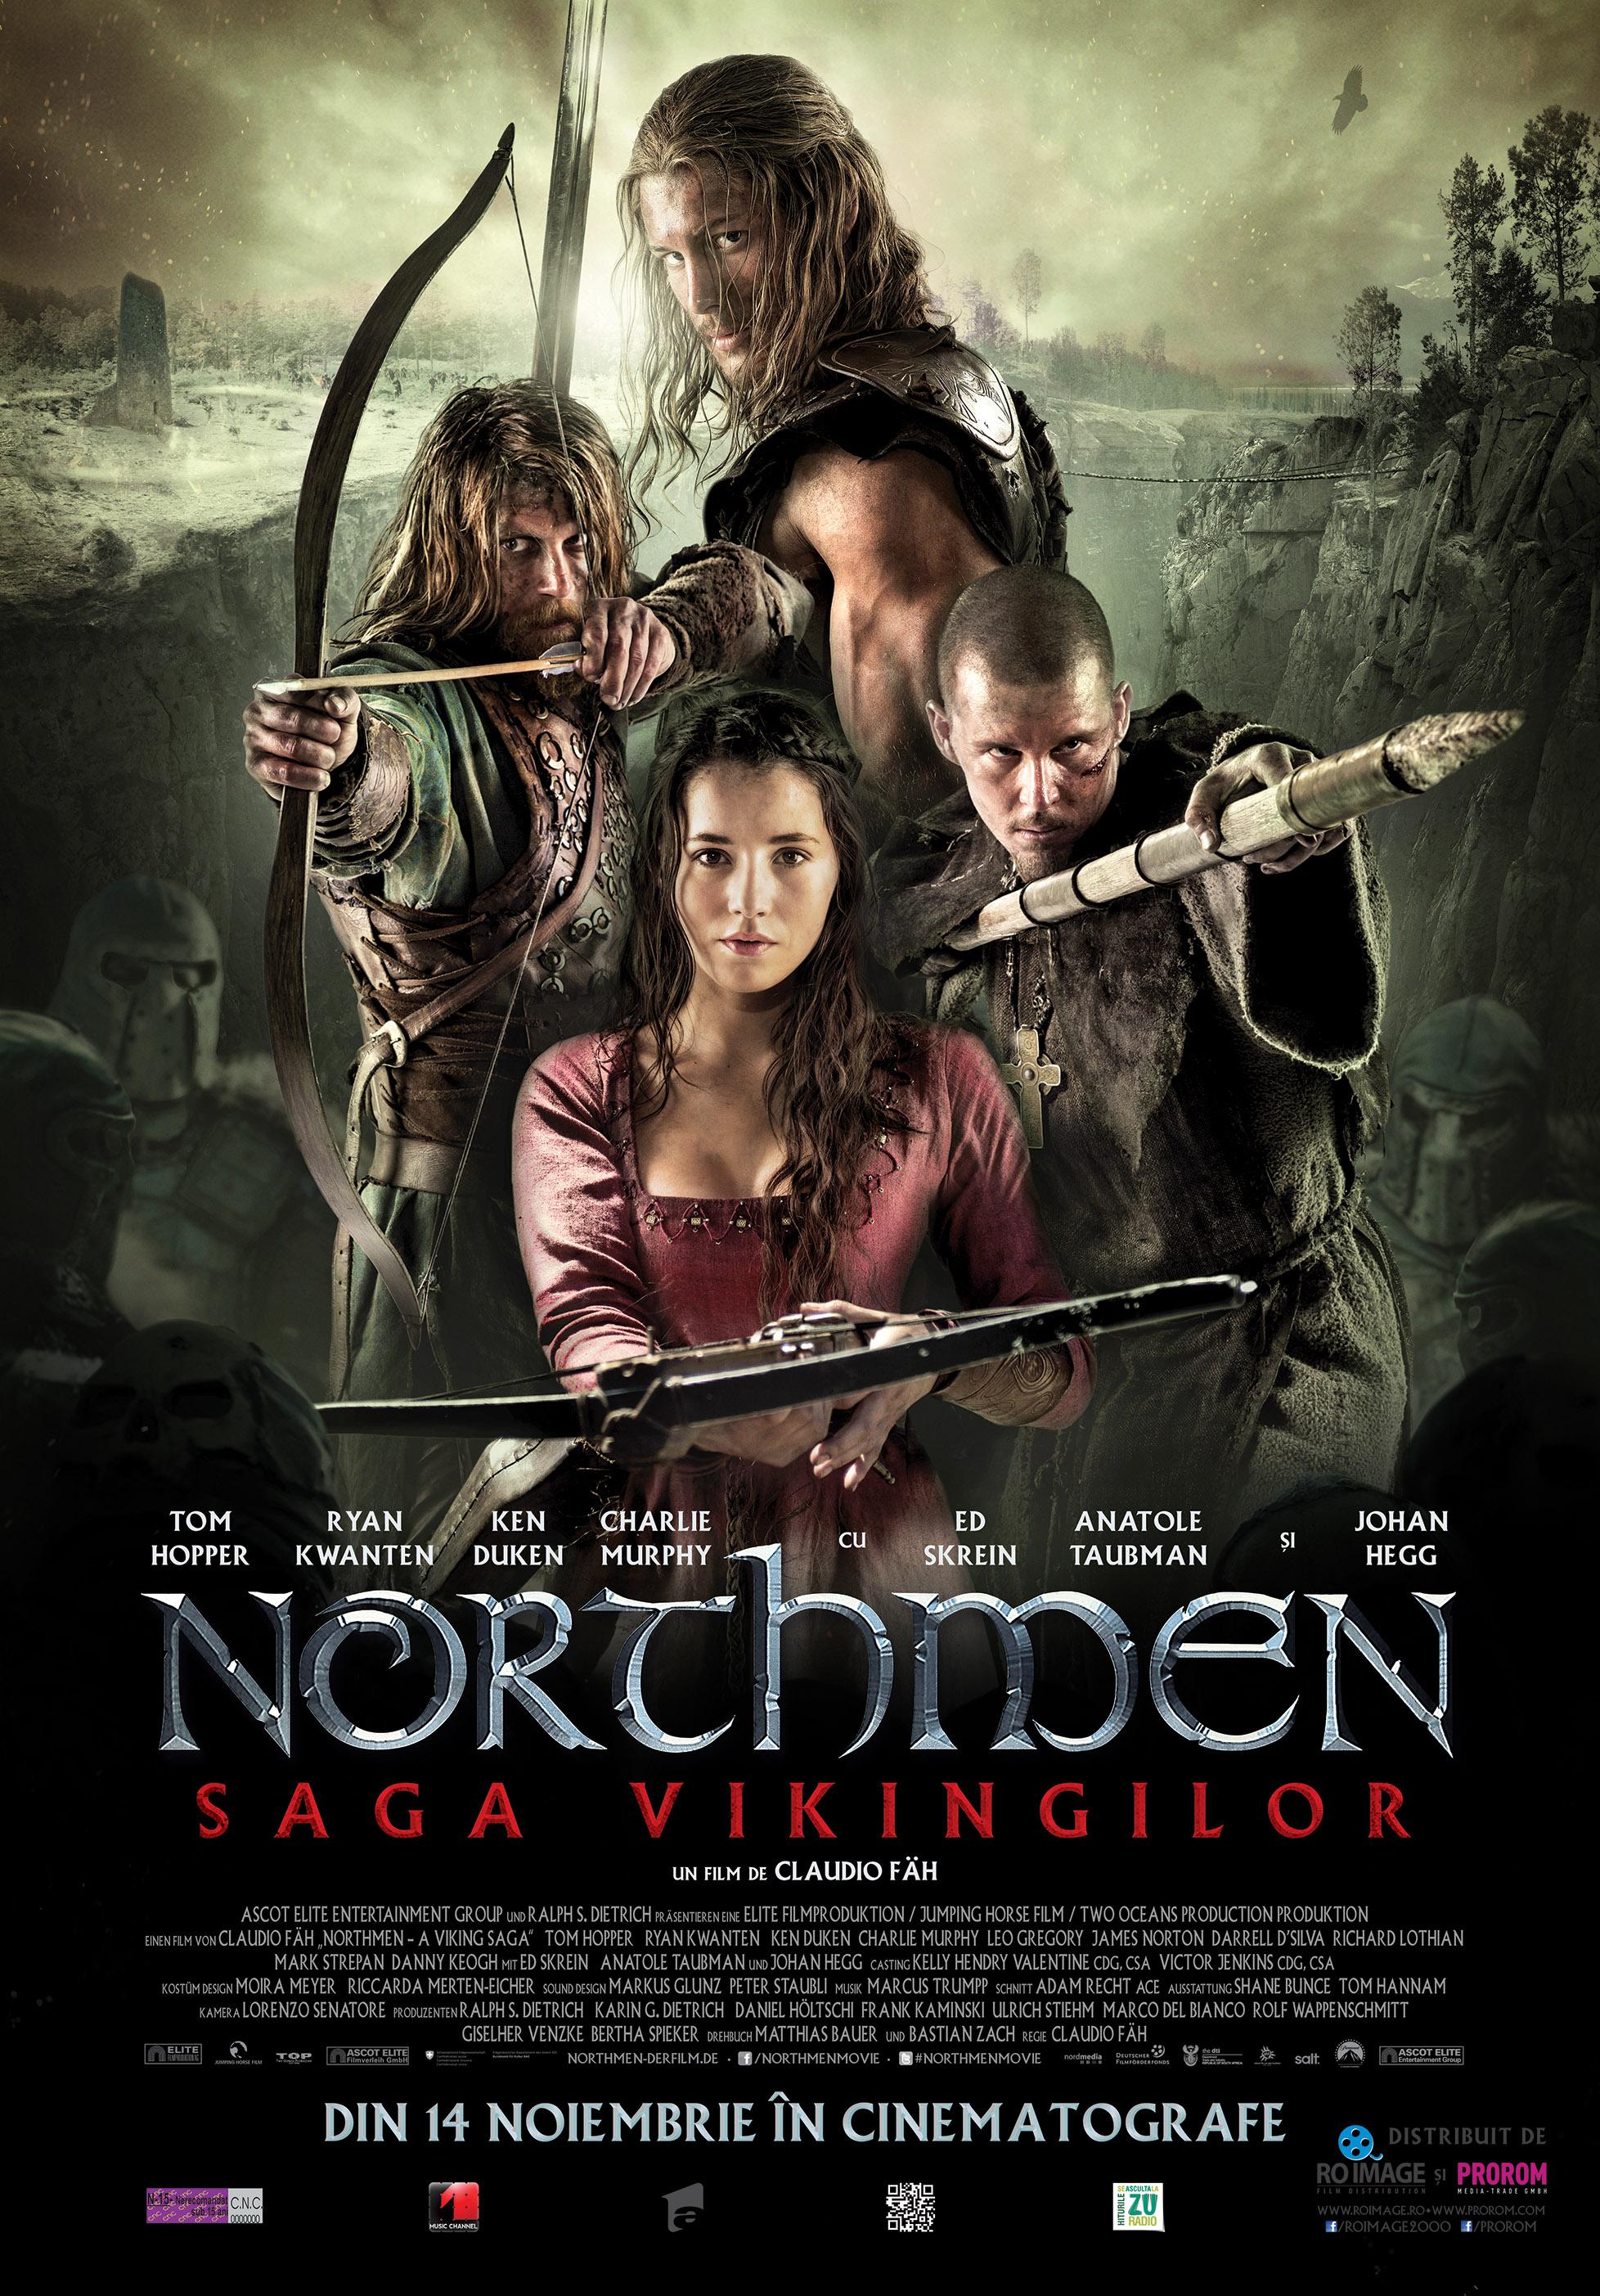 Northmen: Saga Vikingilor / Northmen: A Viking Saga (Premiera)